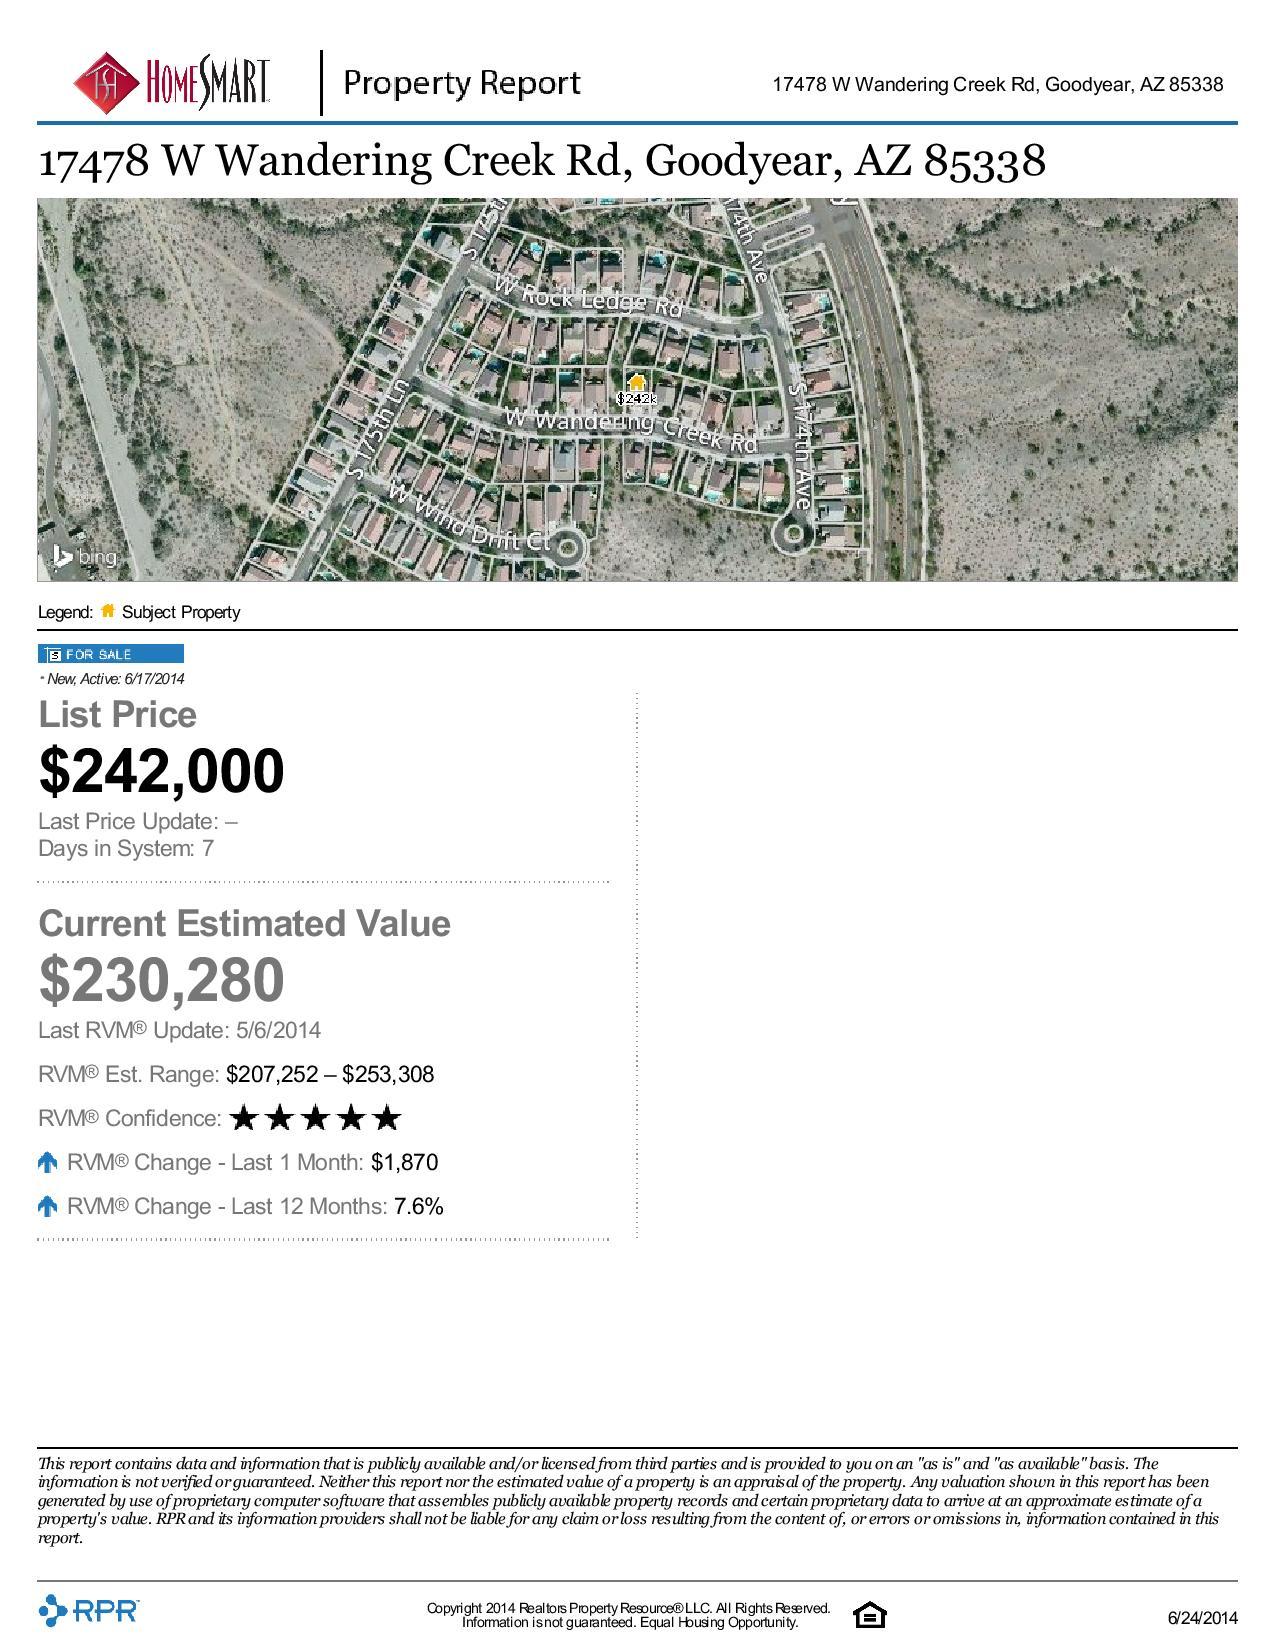 17478-W-Wandering-Creek-Rd-Goodyear-AZ-85338-page-002